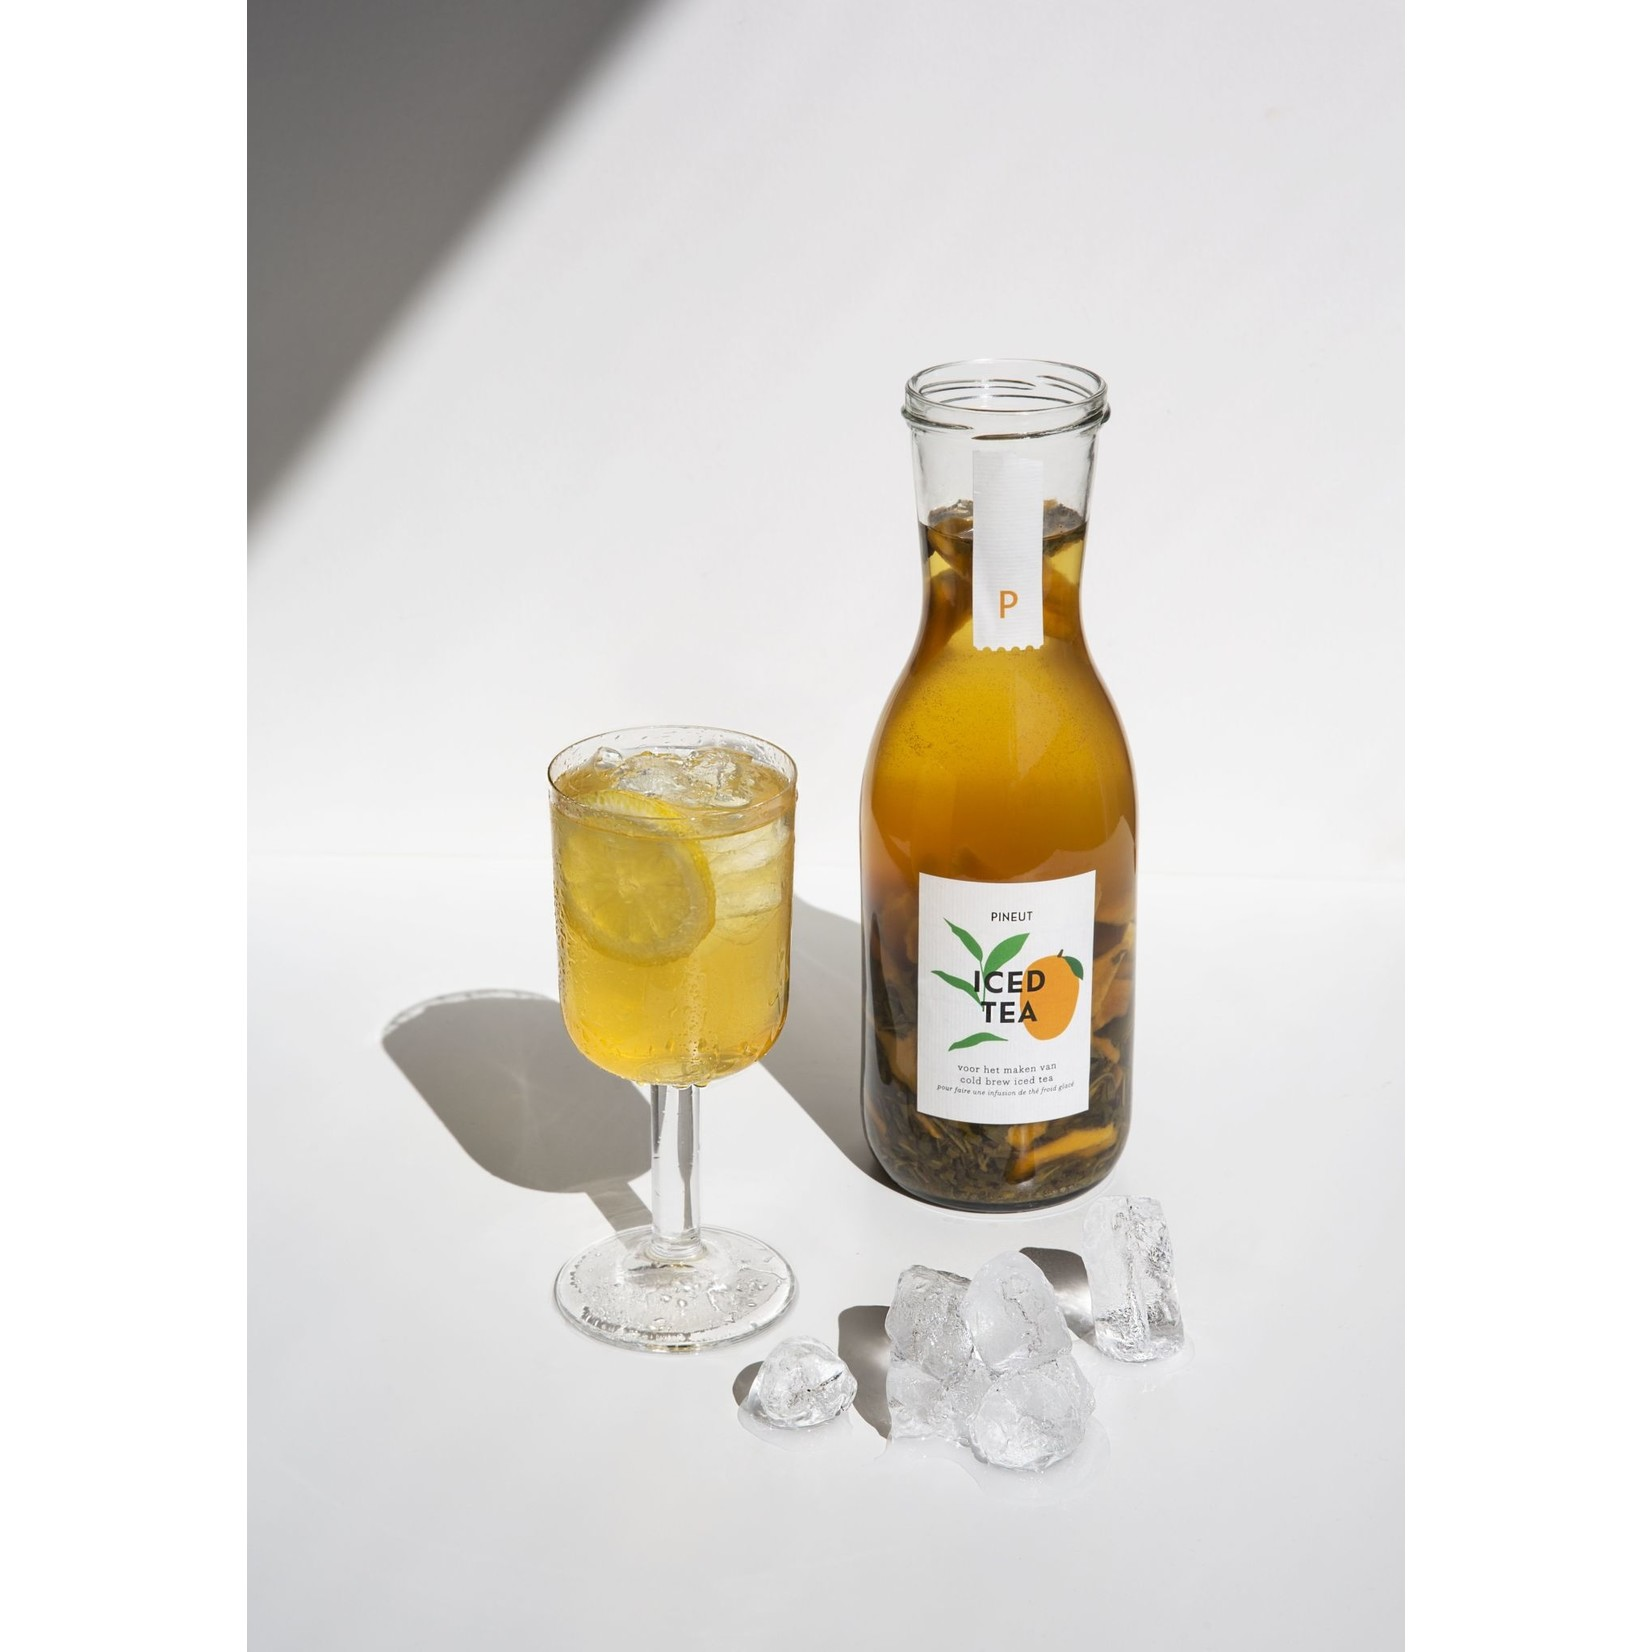 Pineut Cold brew iced tea